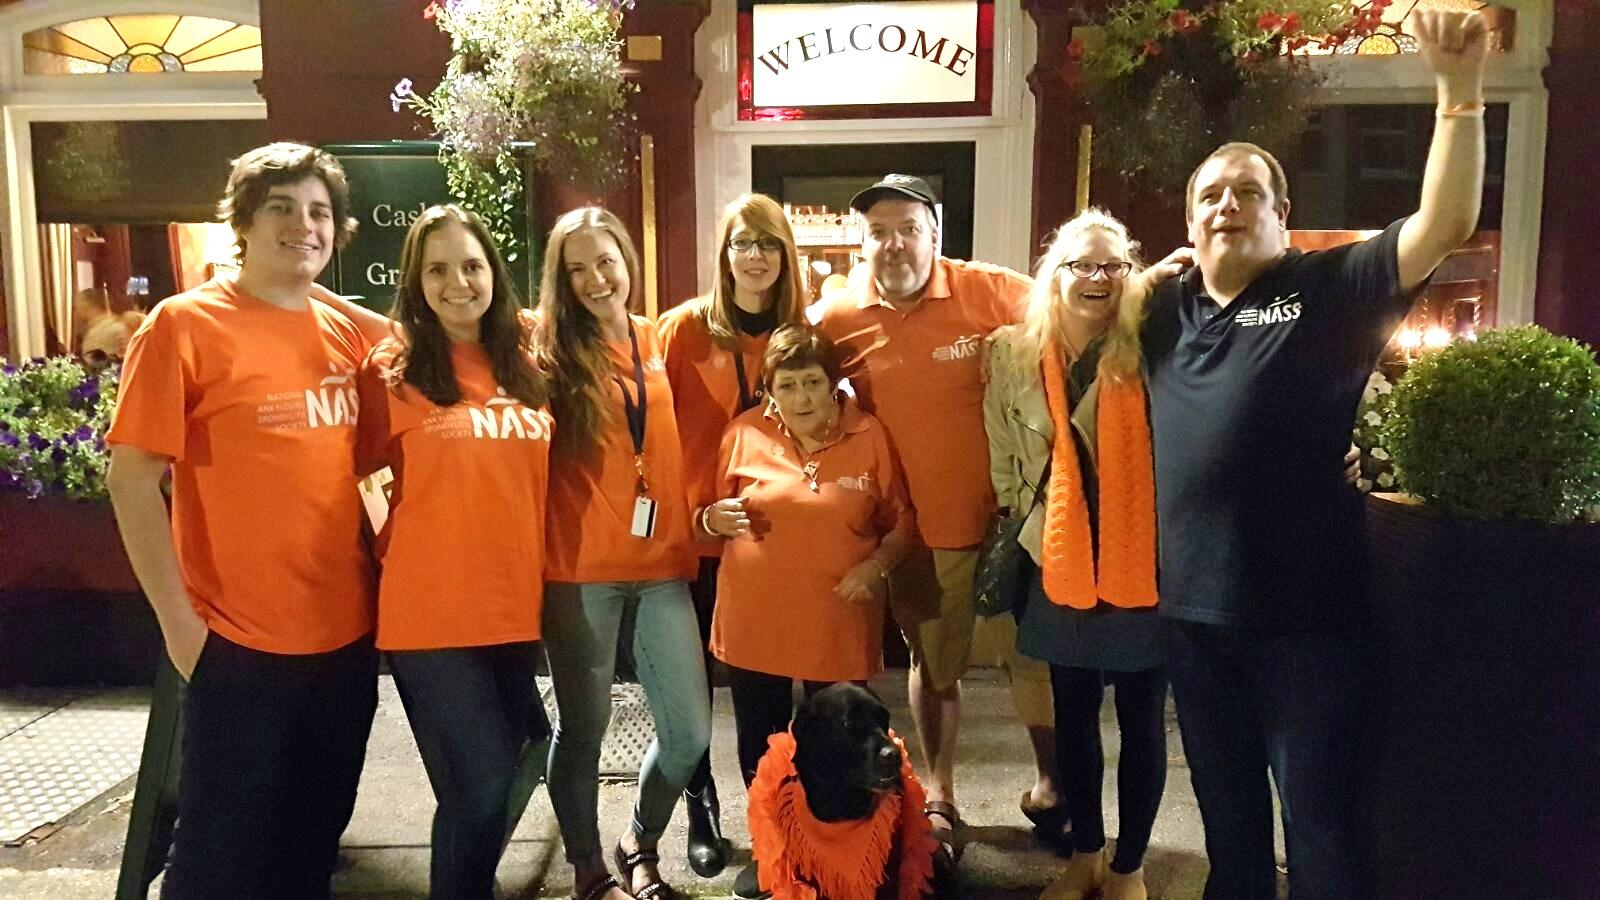 Fundraising - Community - Freelands Tavern